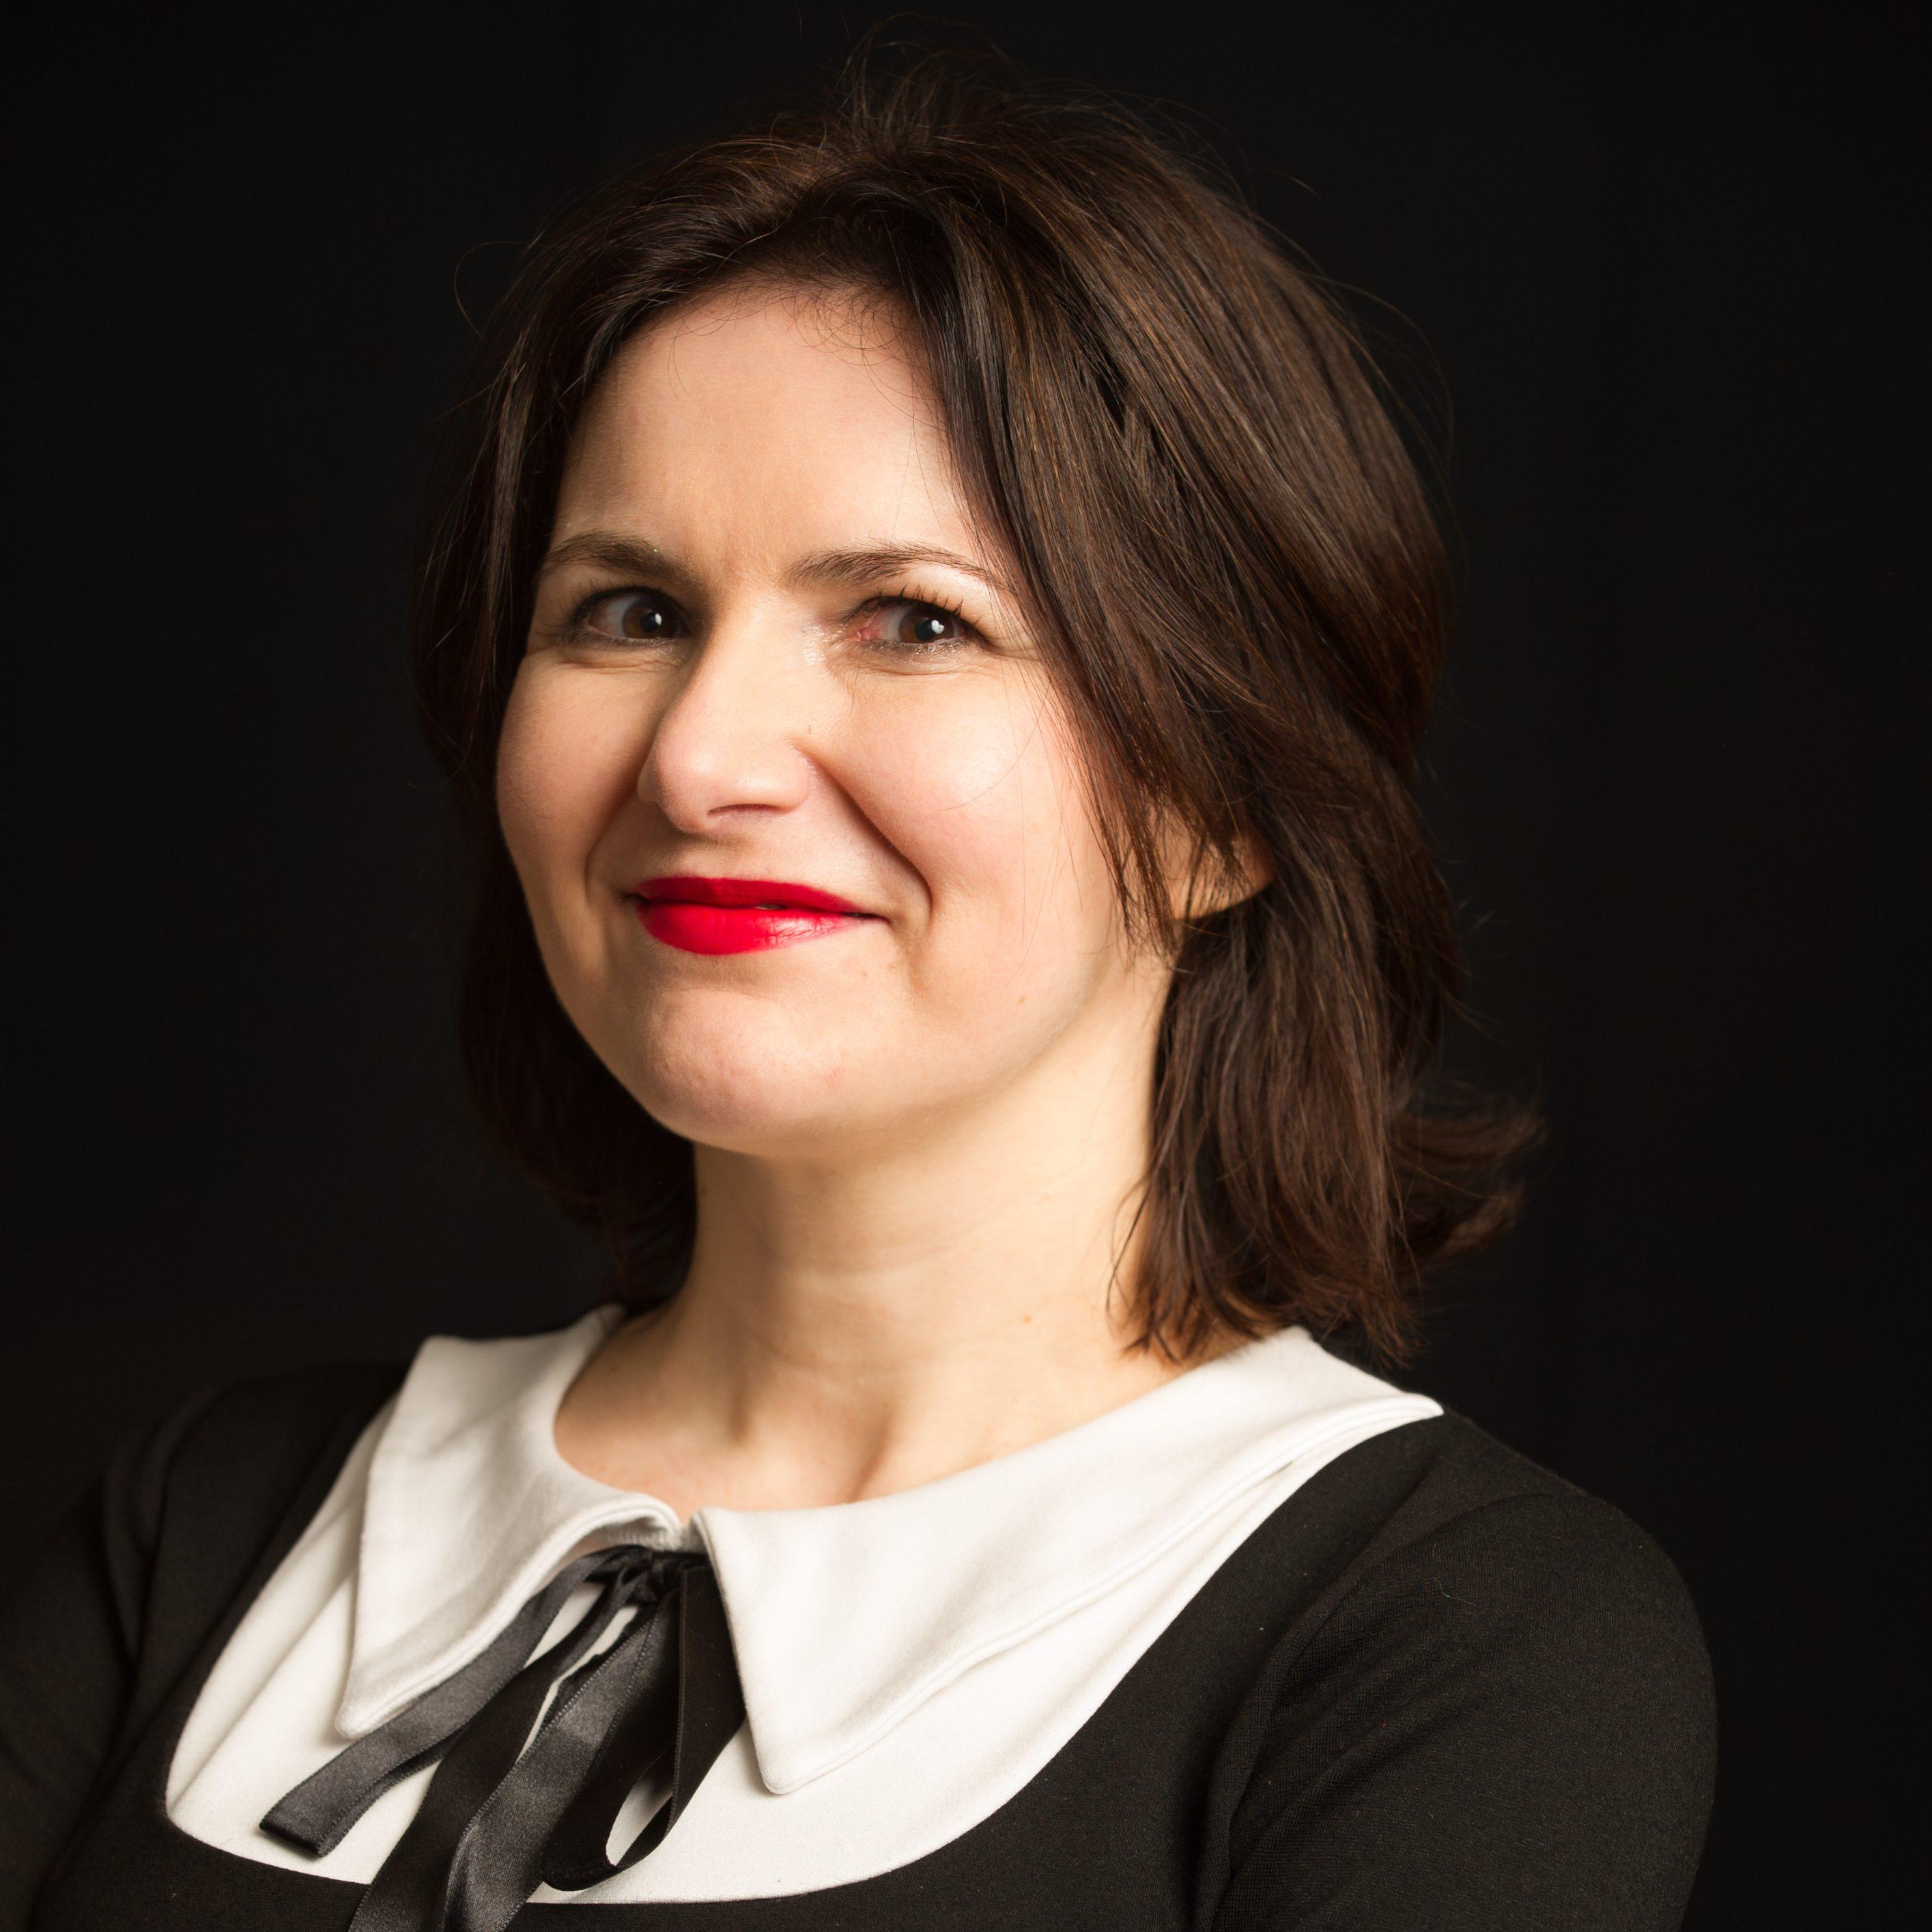 Daniela Verhoeff